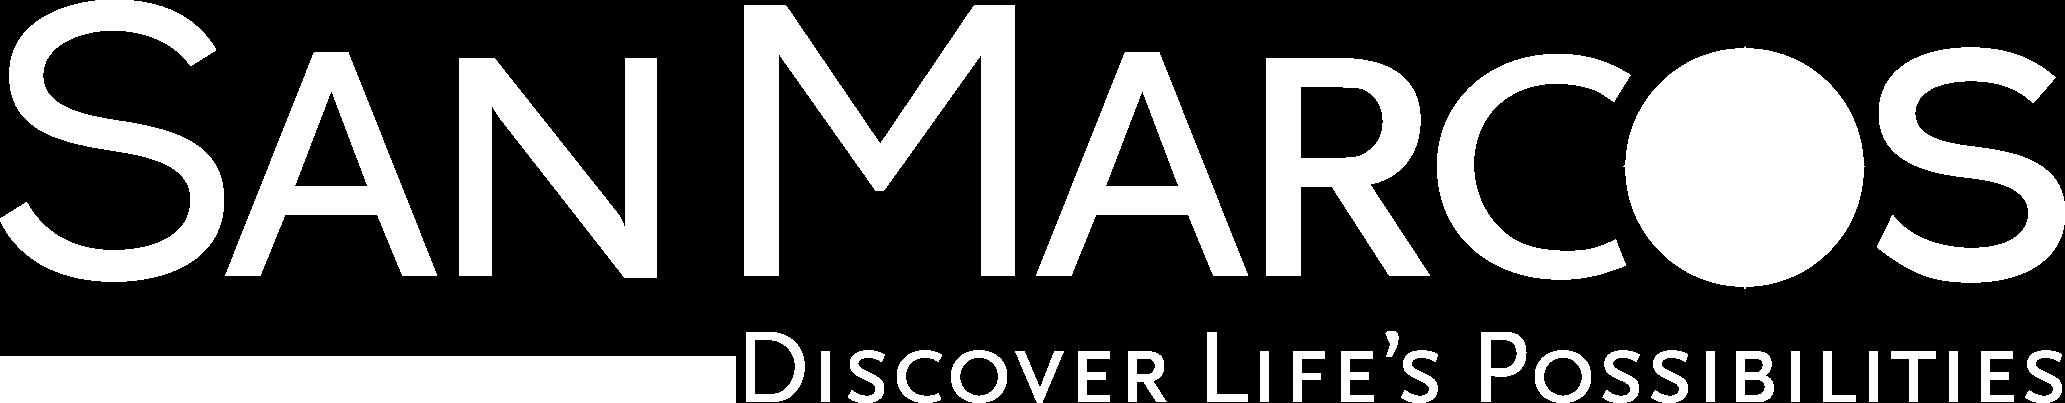 San Marcos Logo - White